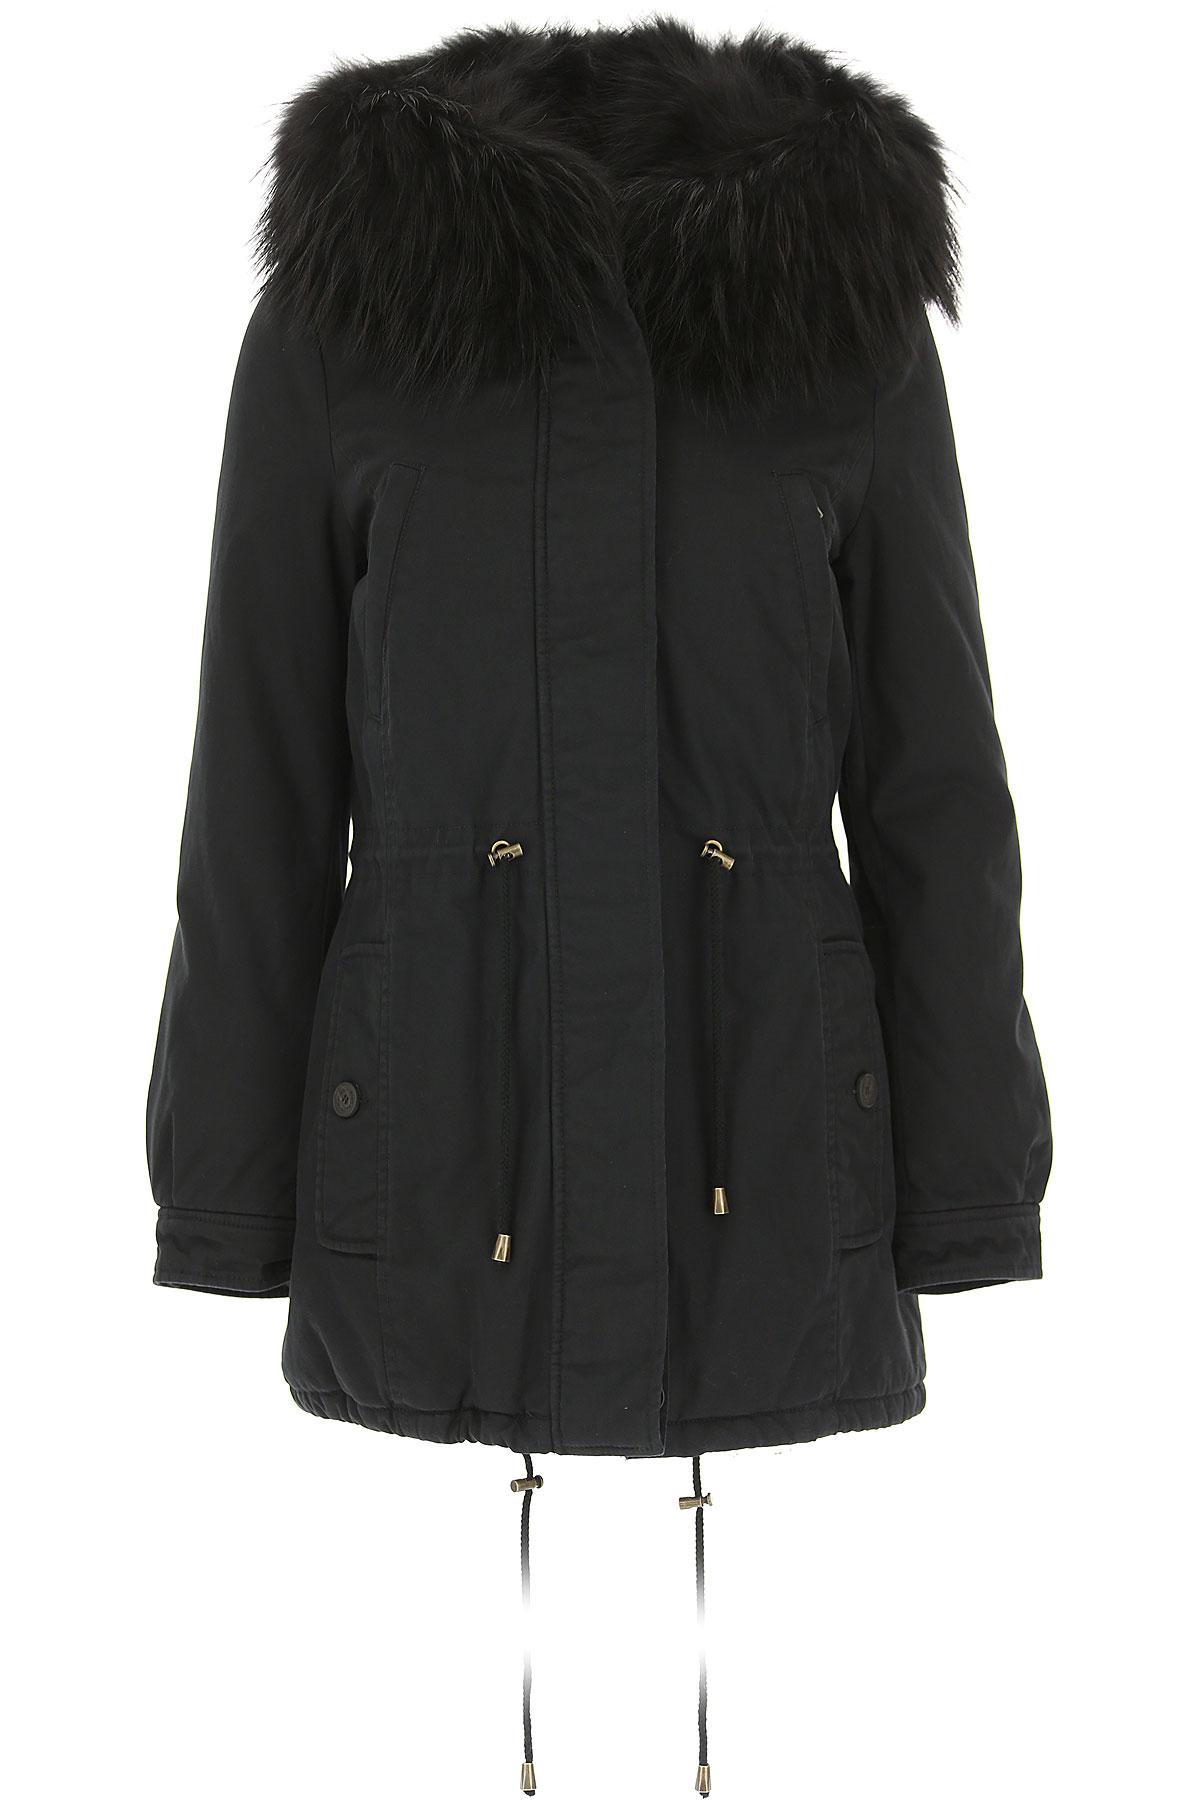 Image of Alessandra Chamonix Women\'s Coat, Black, Cotton, 2017, 4 6 8